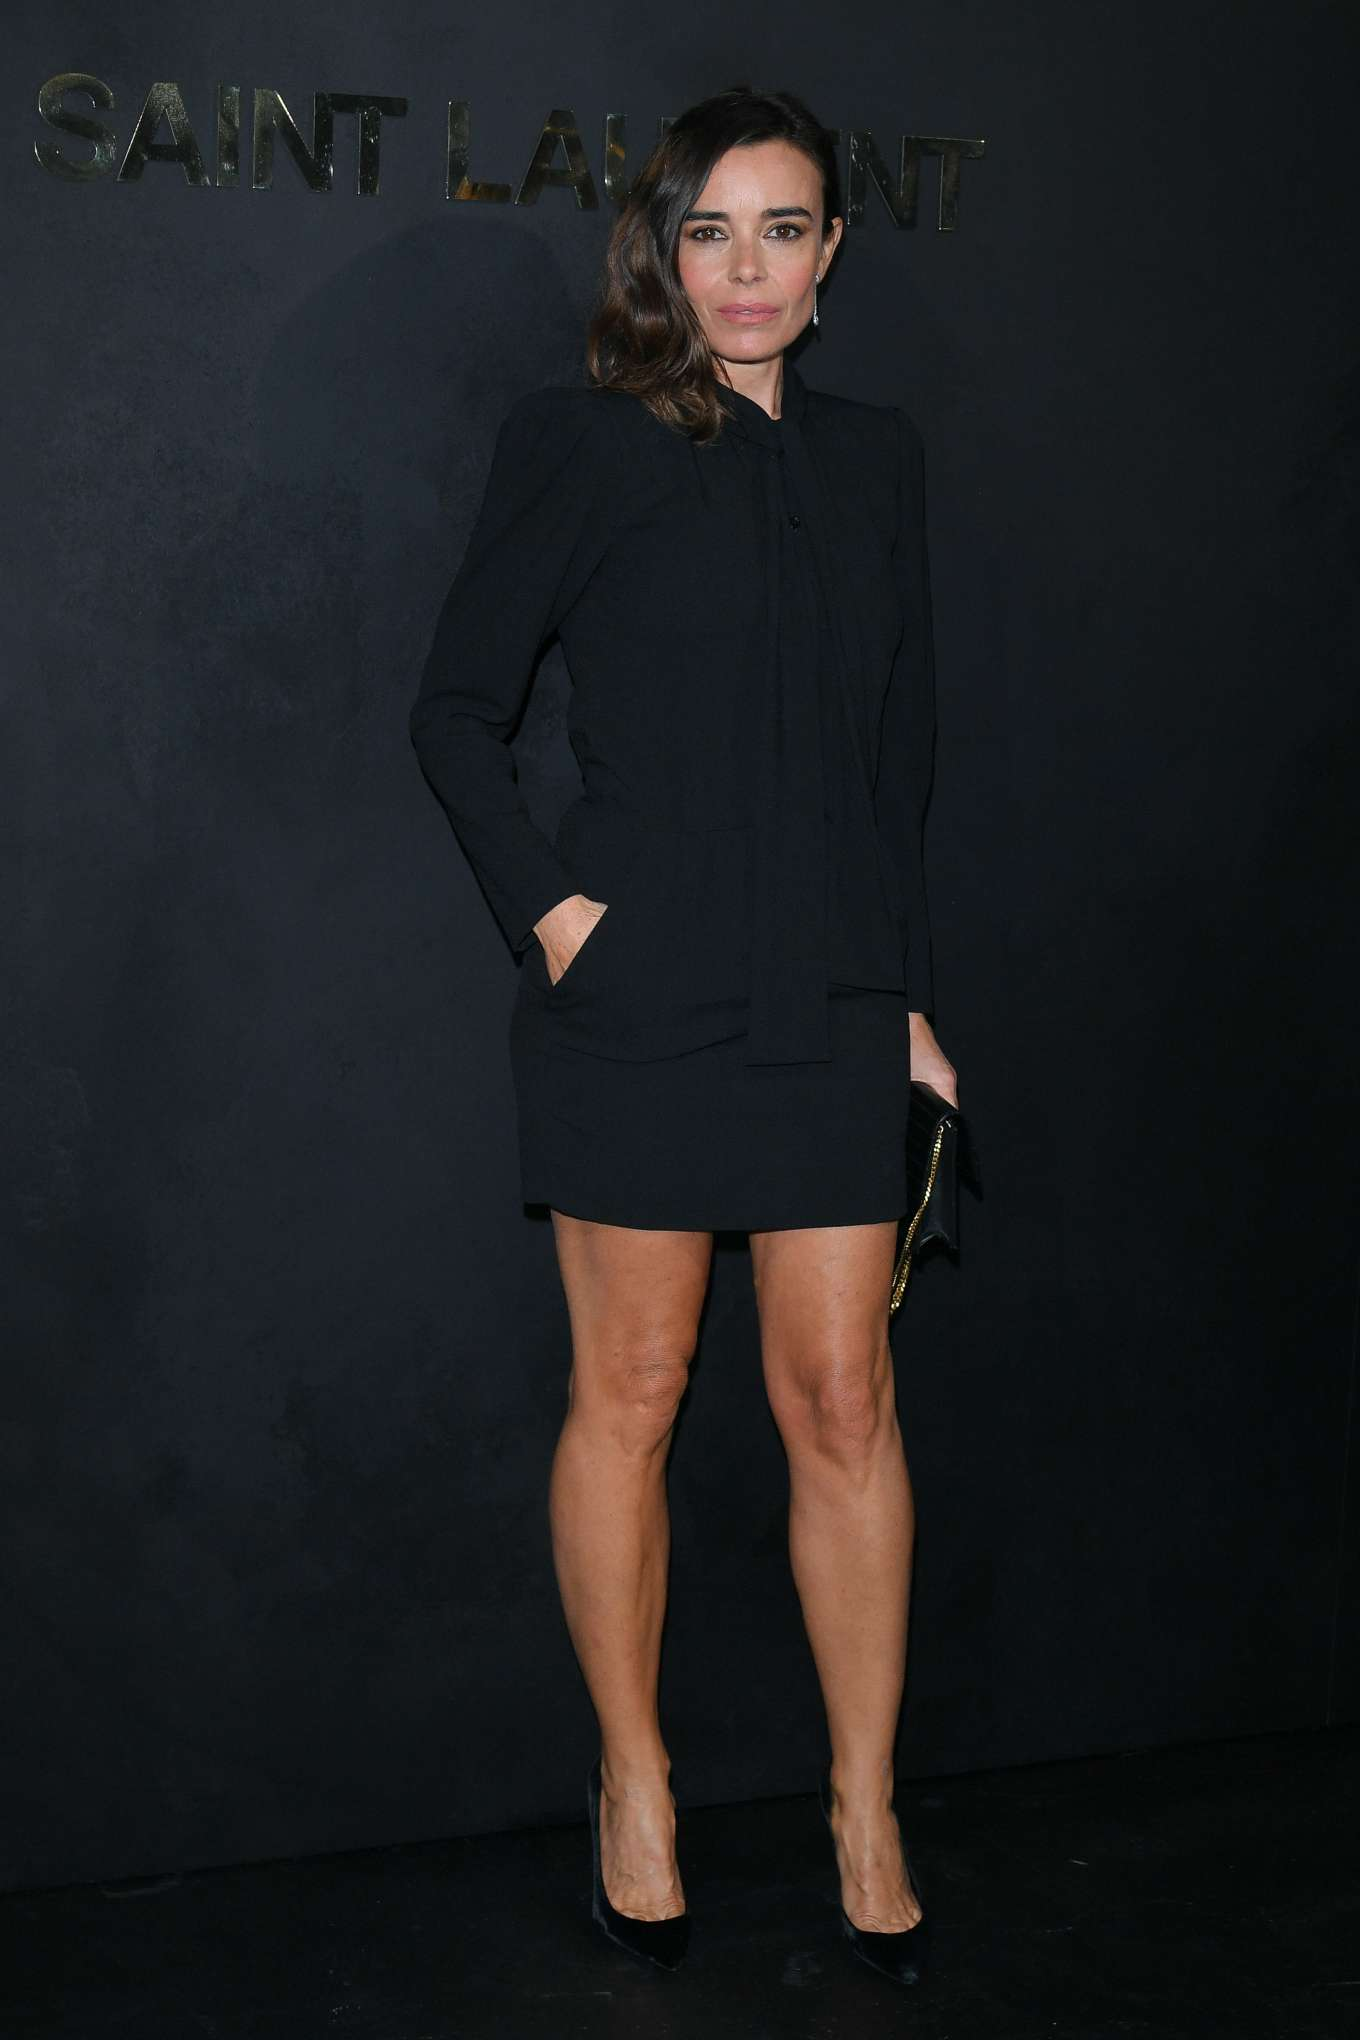 Elodie Bouchez 2019 : Elodie Bouchez – Saint Laurent Womenswear SS 2020 Show at Paris Fashion Week-15